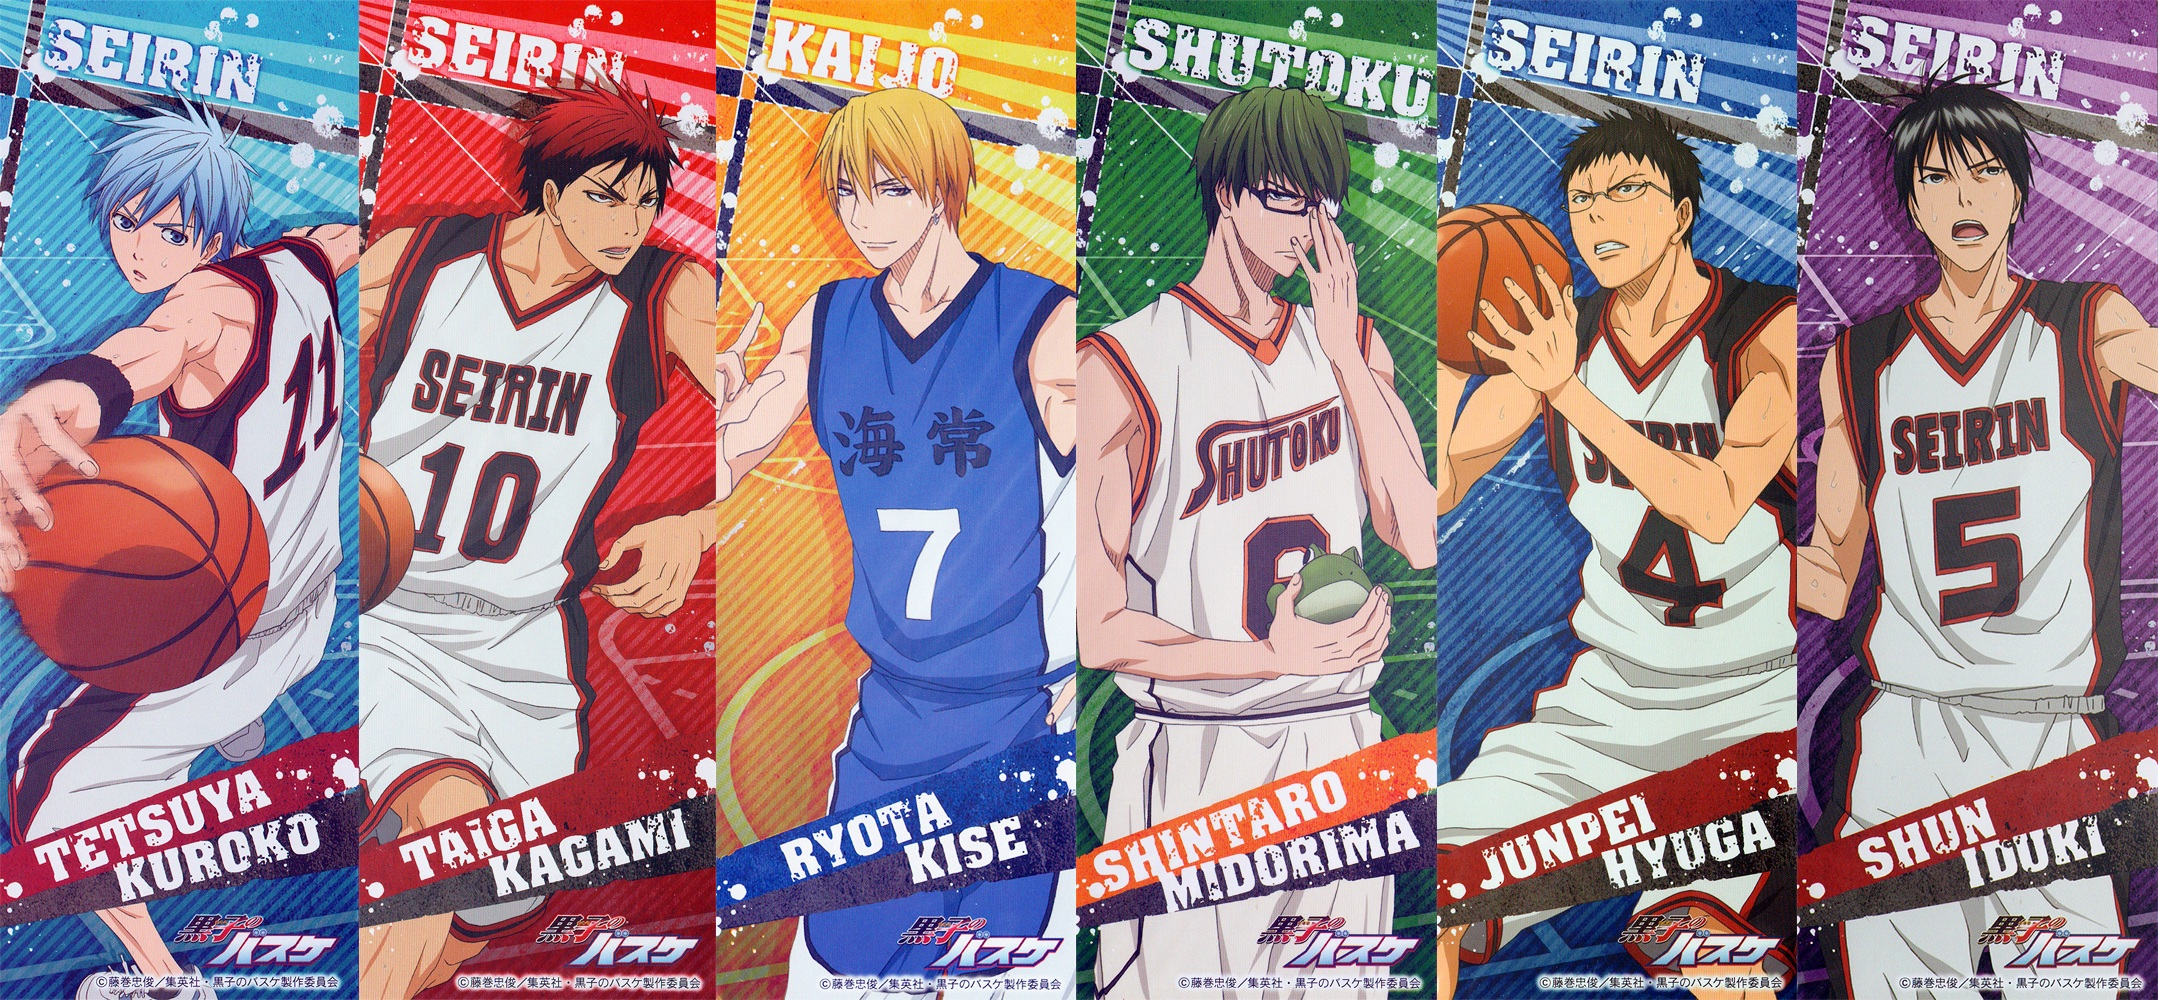 Kuroko no basuke kurokos basketball image 1175337 zerochan view fullsize kuroko no basuke image voltagebd Images